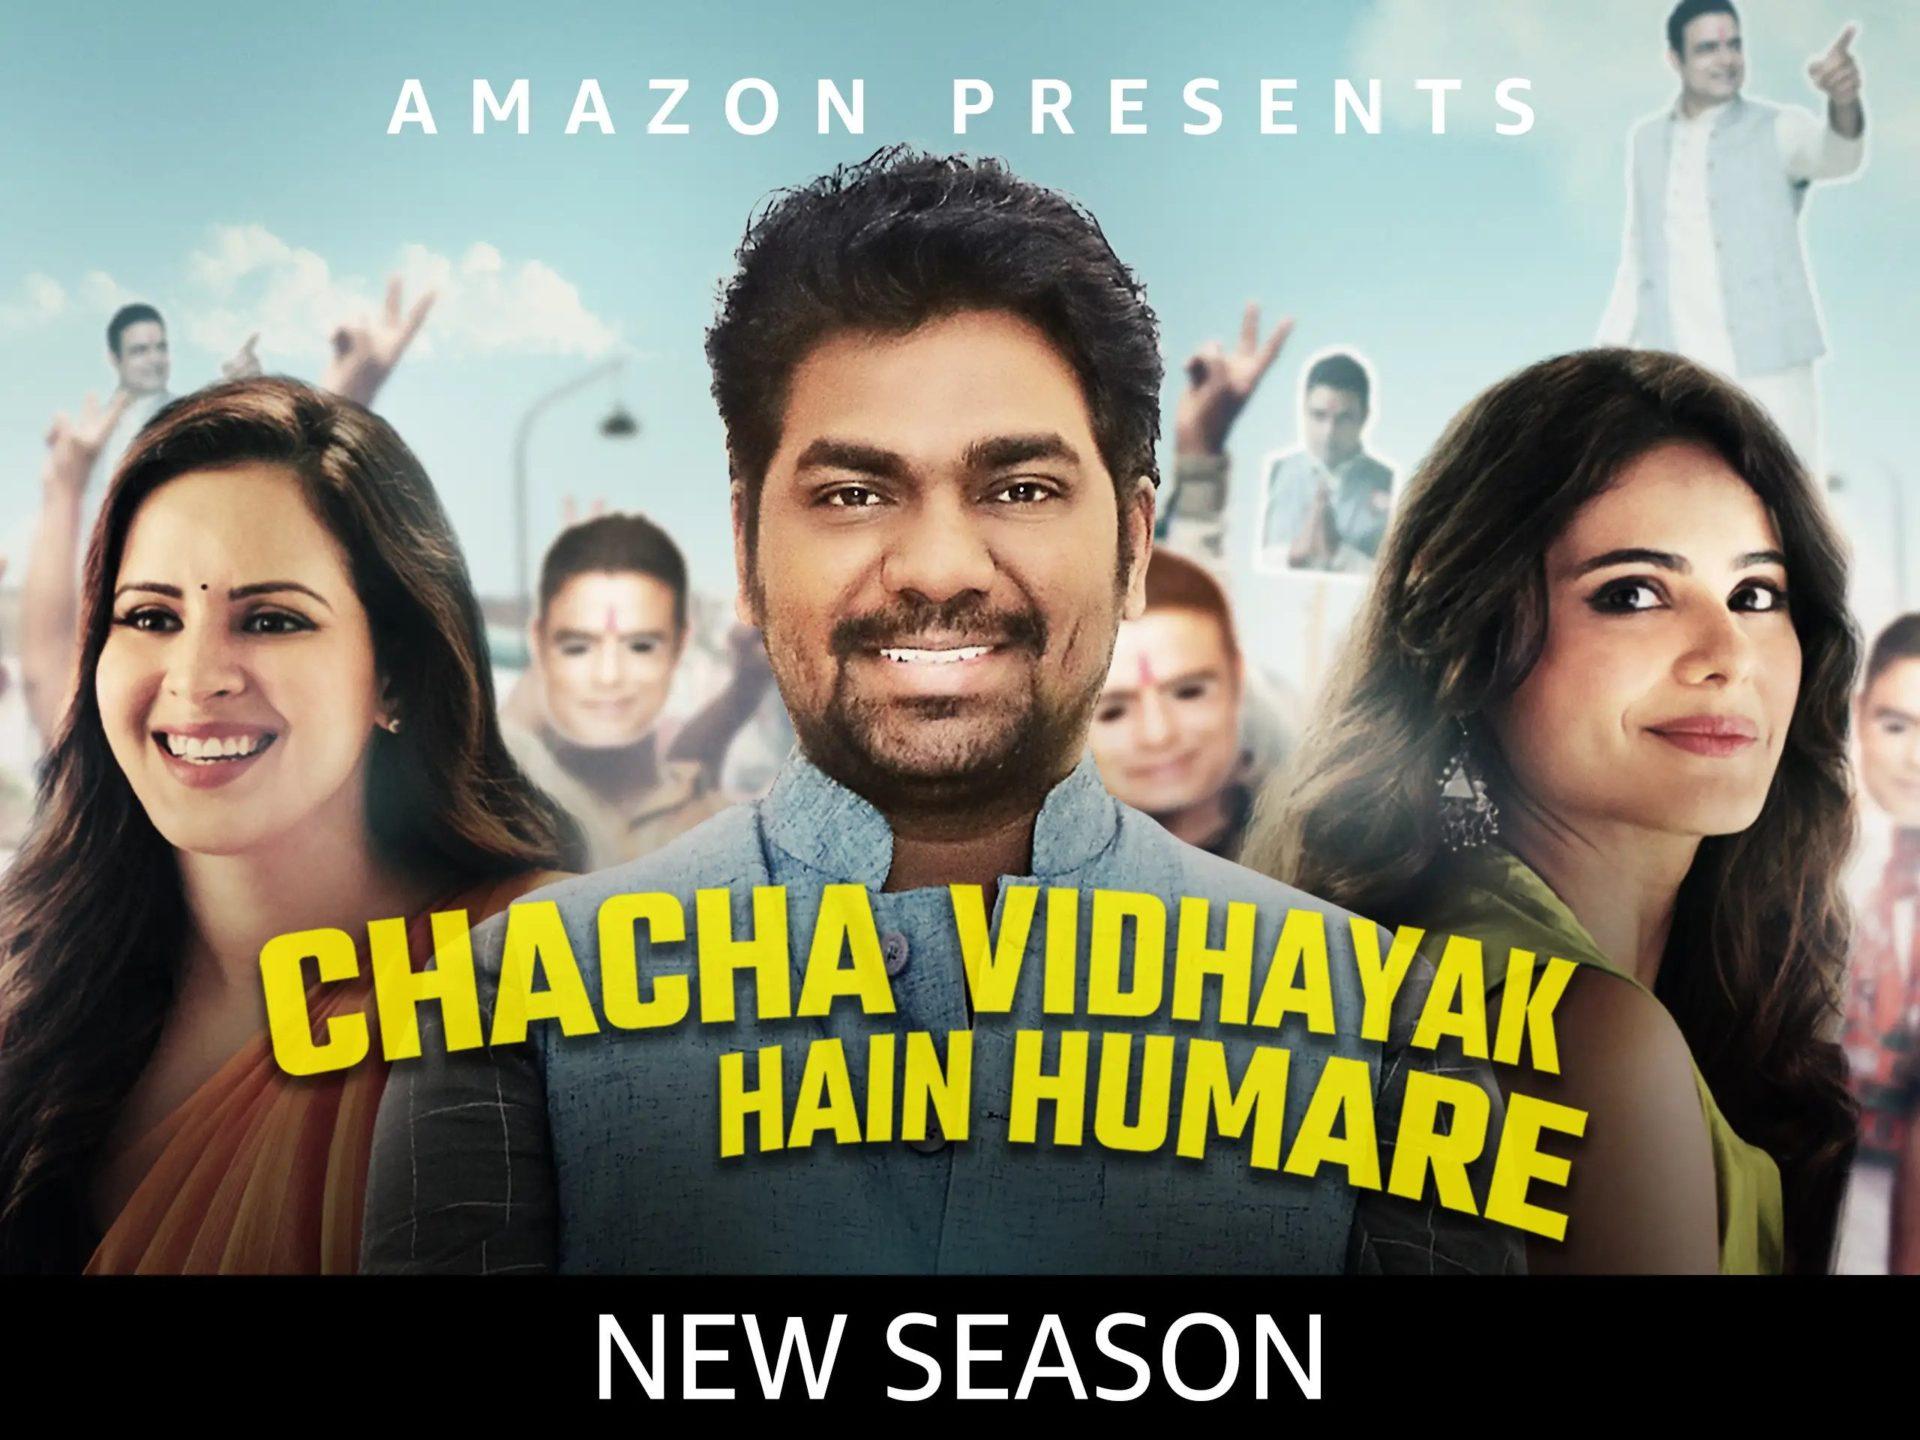 Chacha Vidhayak hai hamare season 2